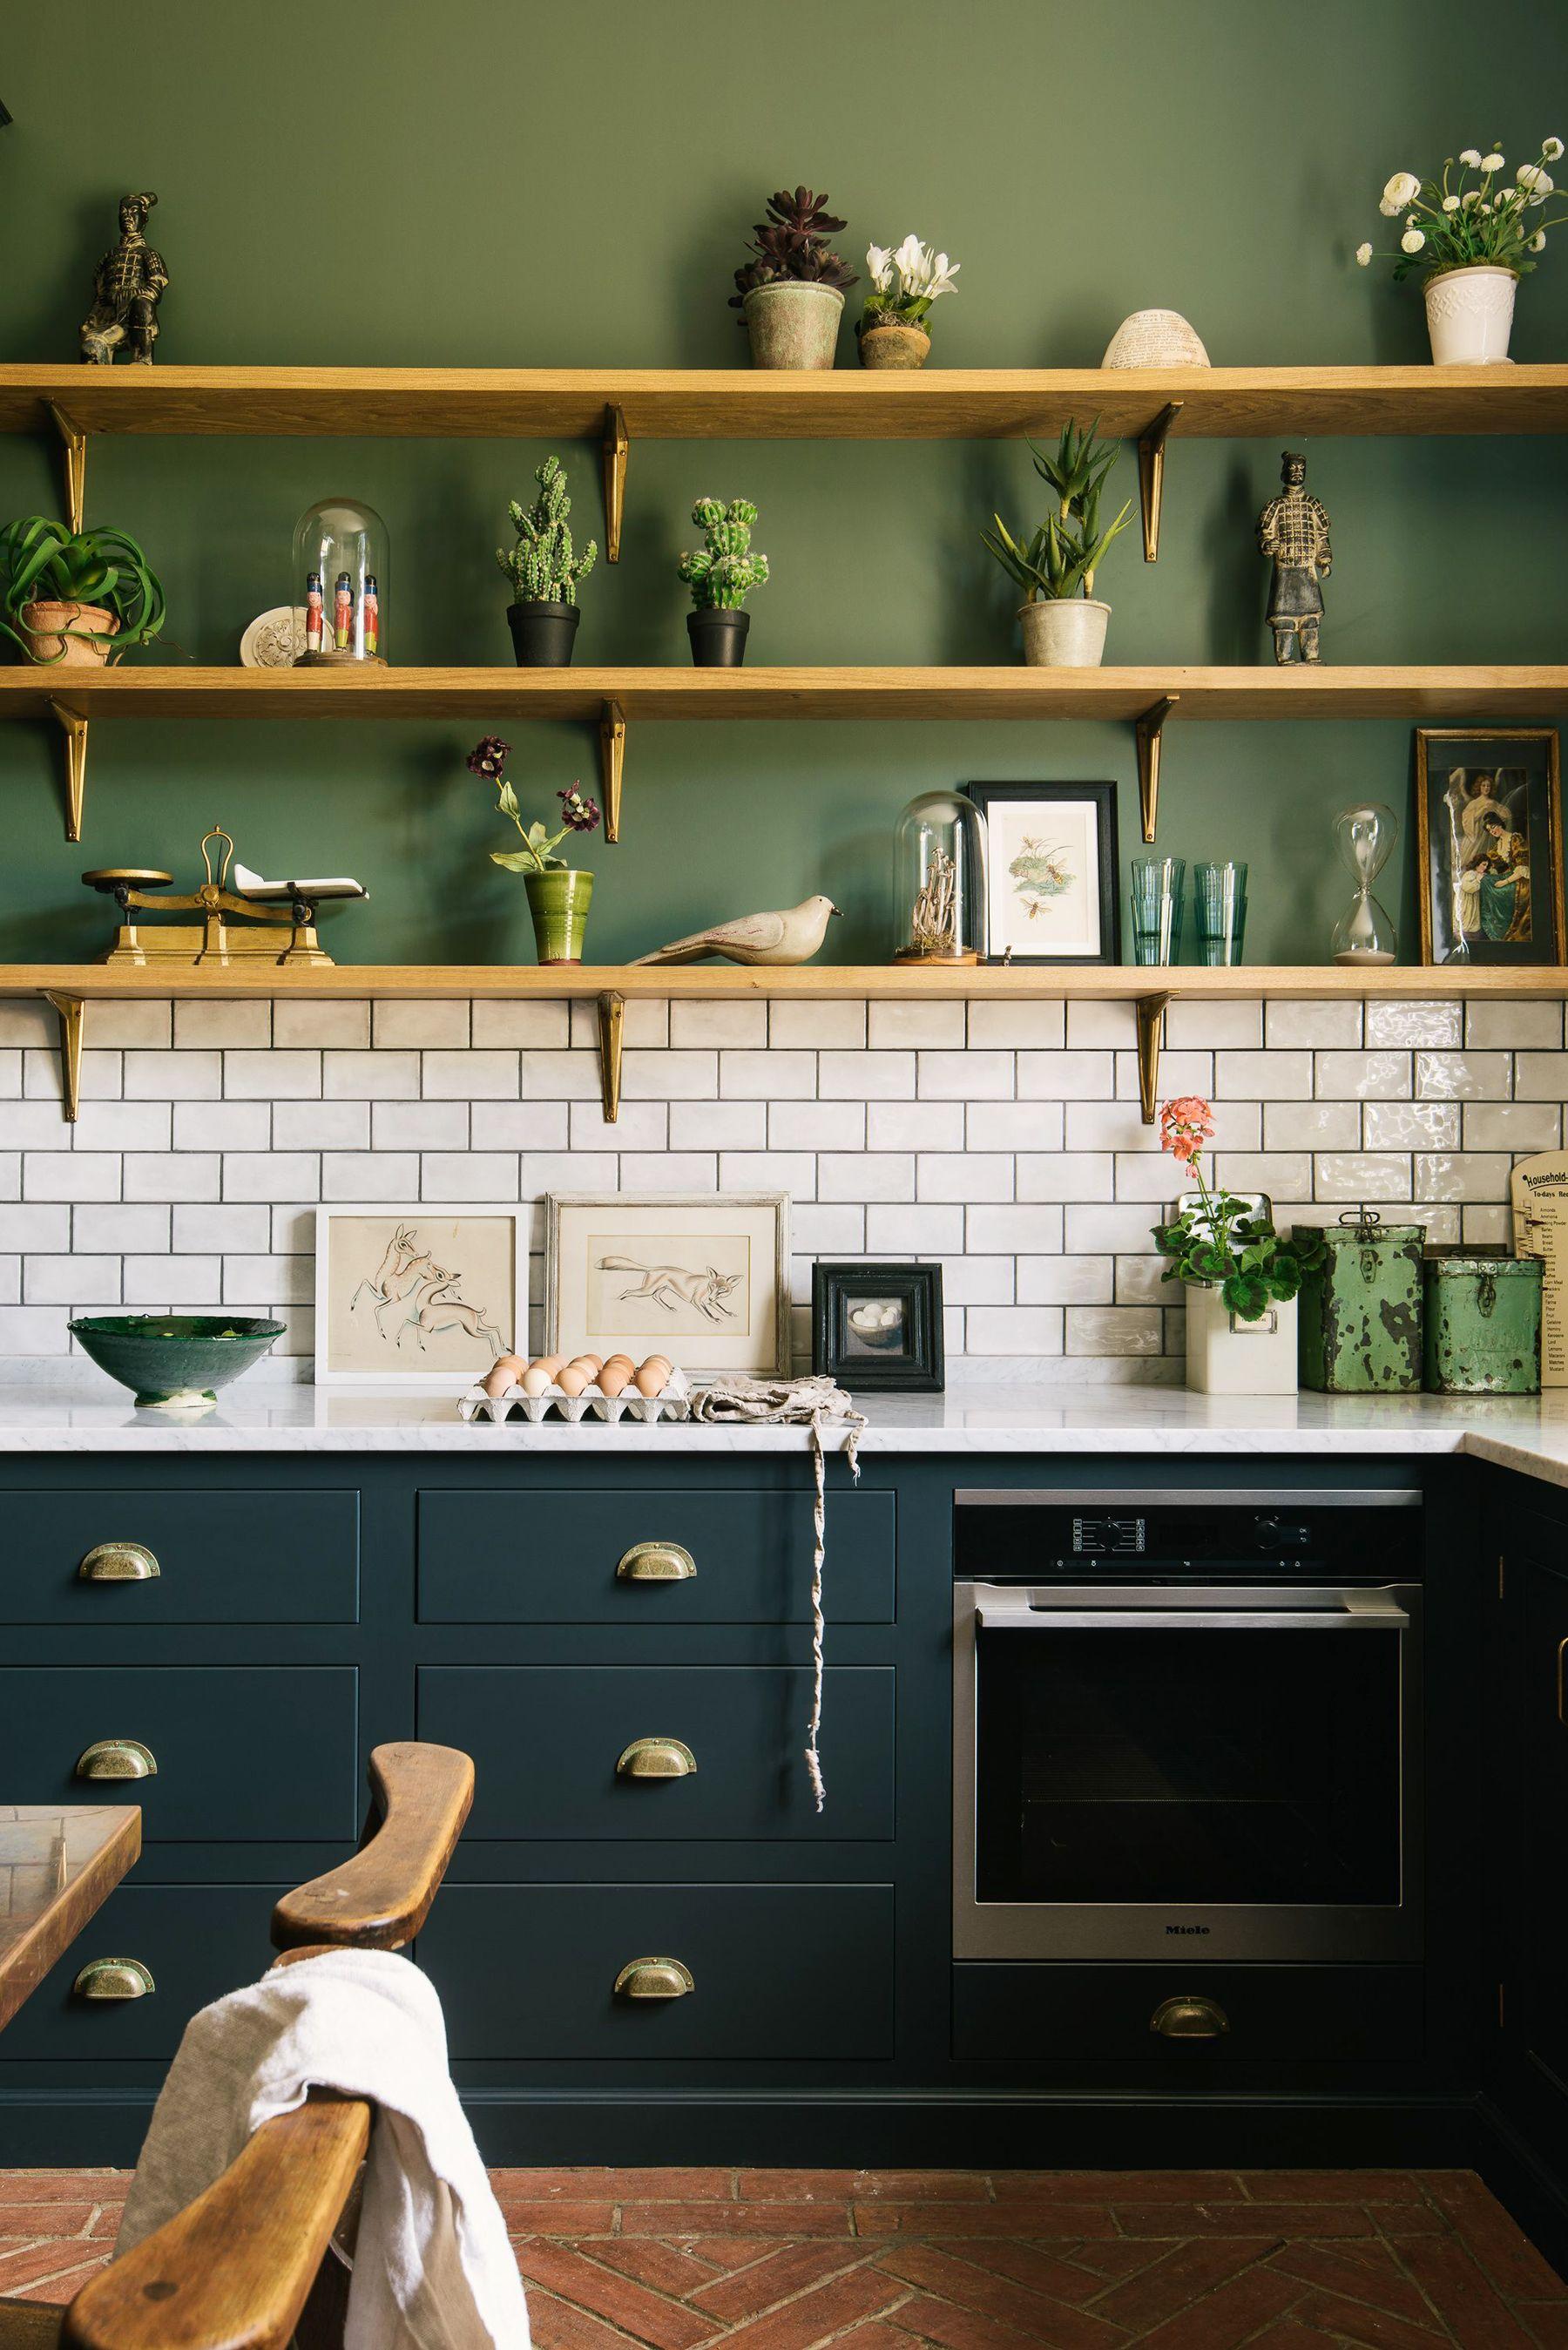 50 Best Kitchen Backsplash Ideas , Tile Designs for Kitchen